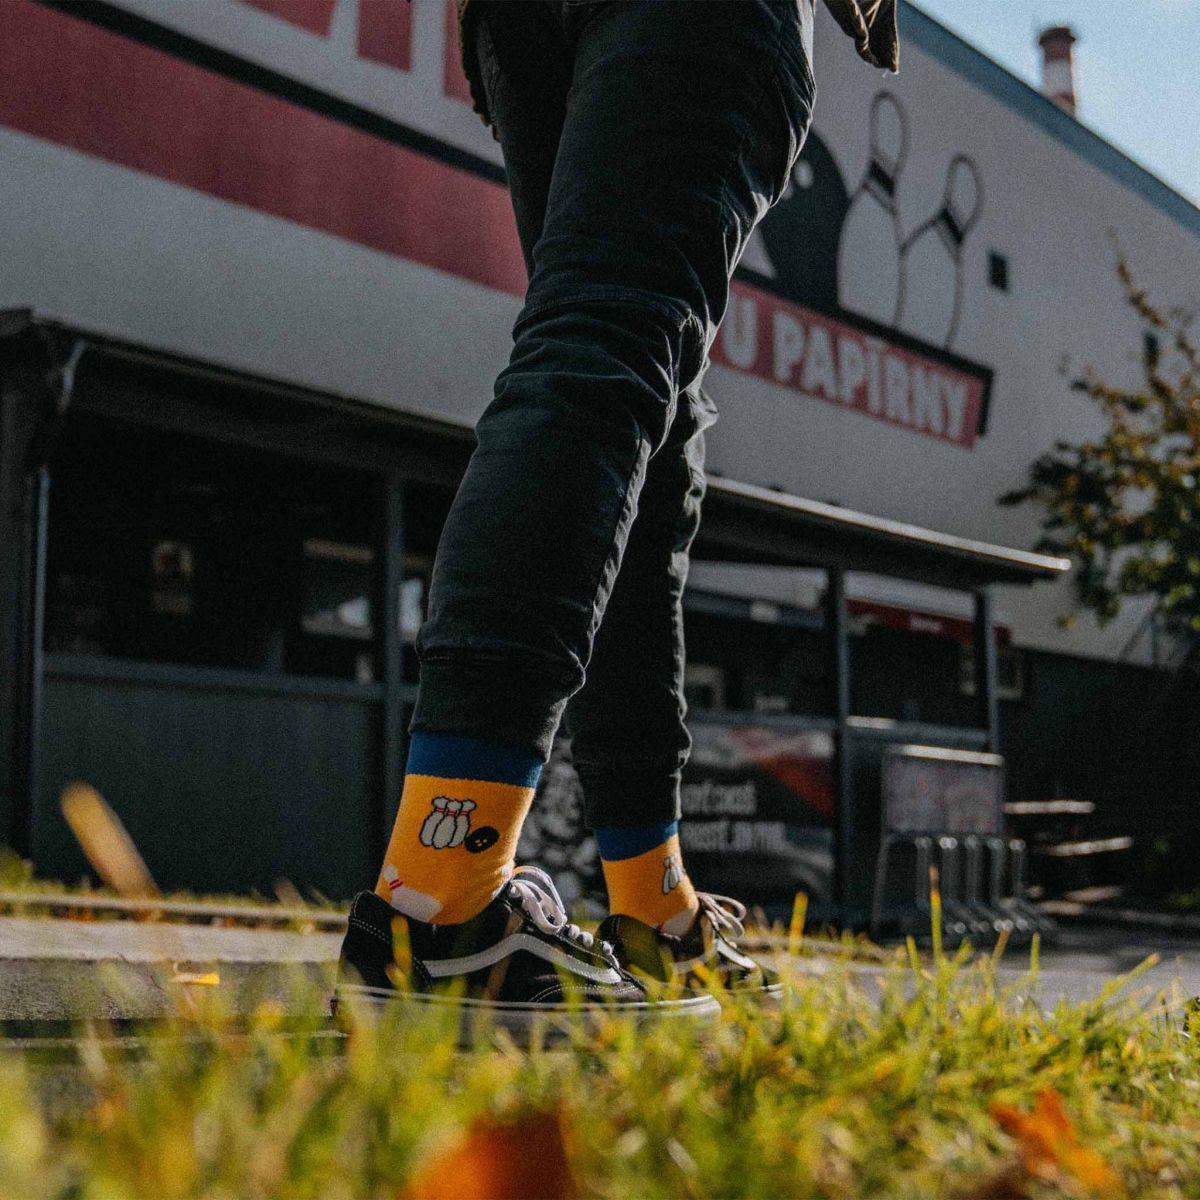 Socken - Bowling p2